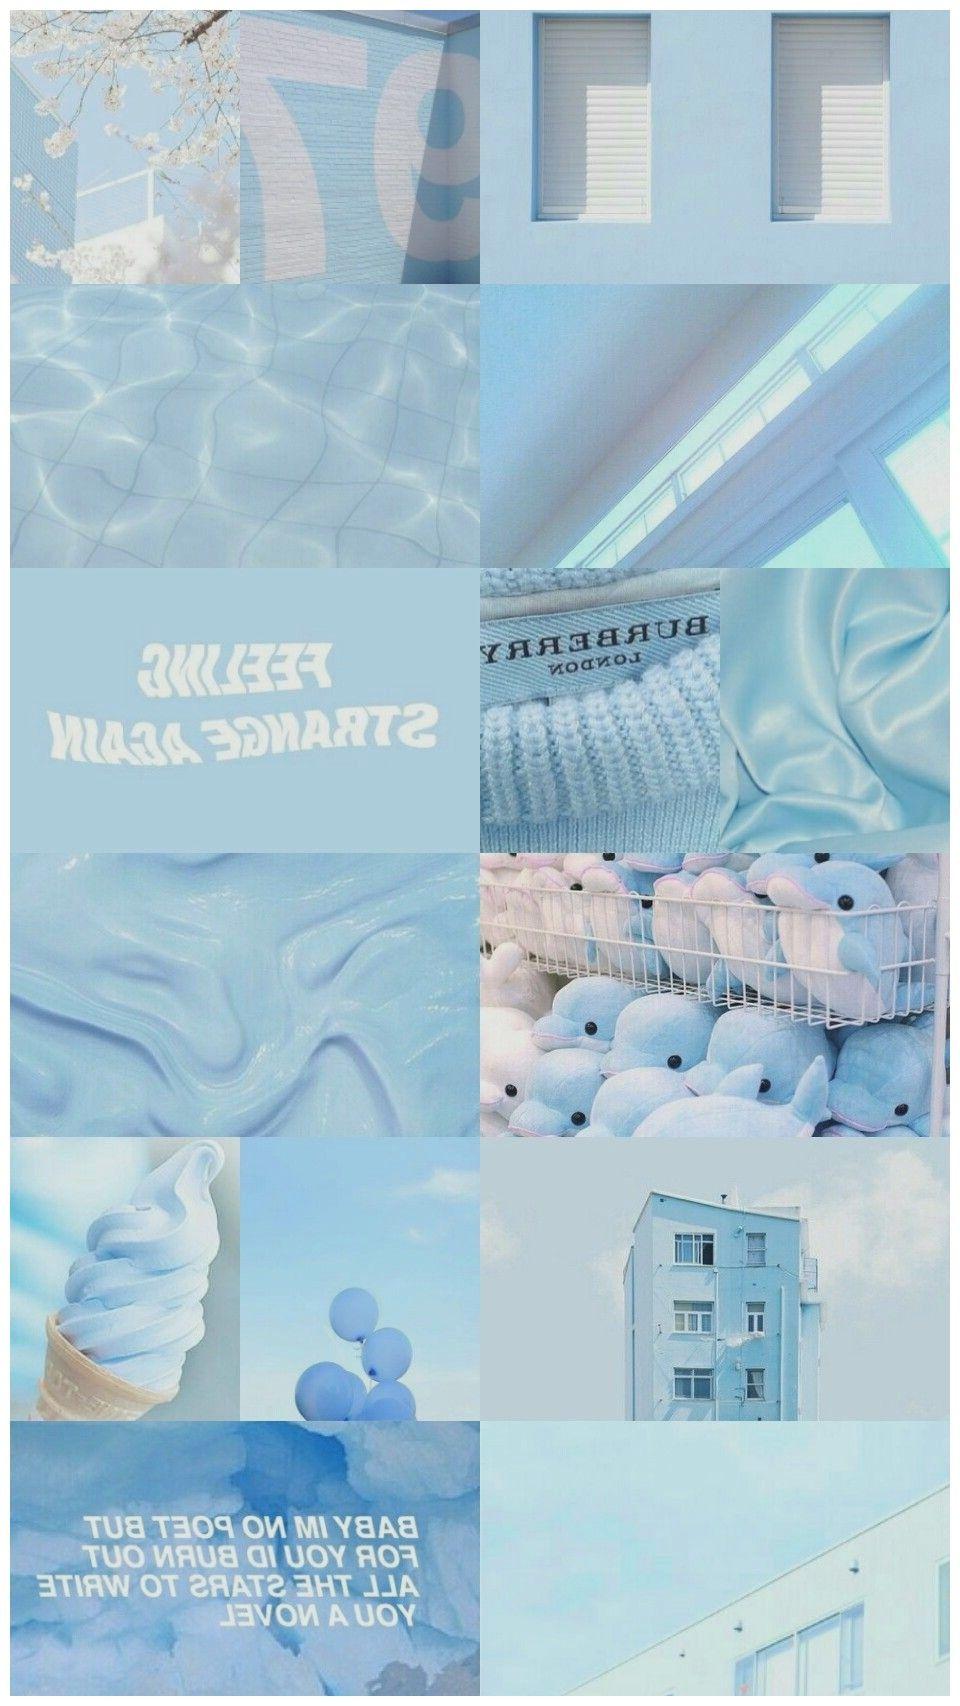 Wallpaper Pastel Blue Aesthetic : wallpaper, pastel, aesthetic, Pastel, Aesthetic, Wallpaper, Estetika, Biru,, Warna, Aqua,, Indah